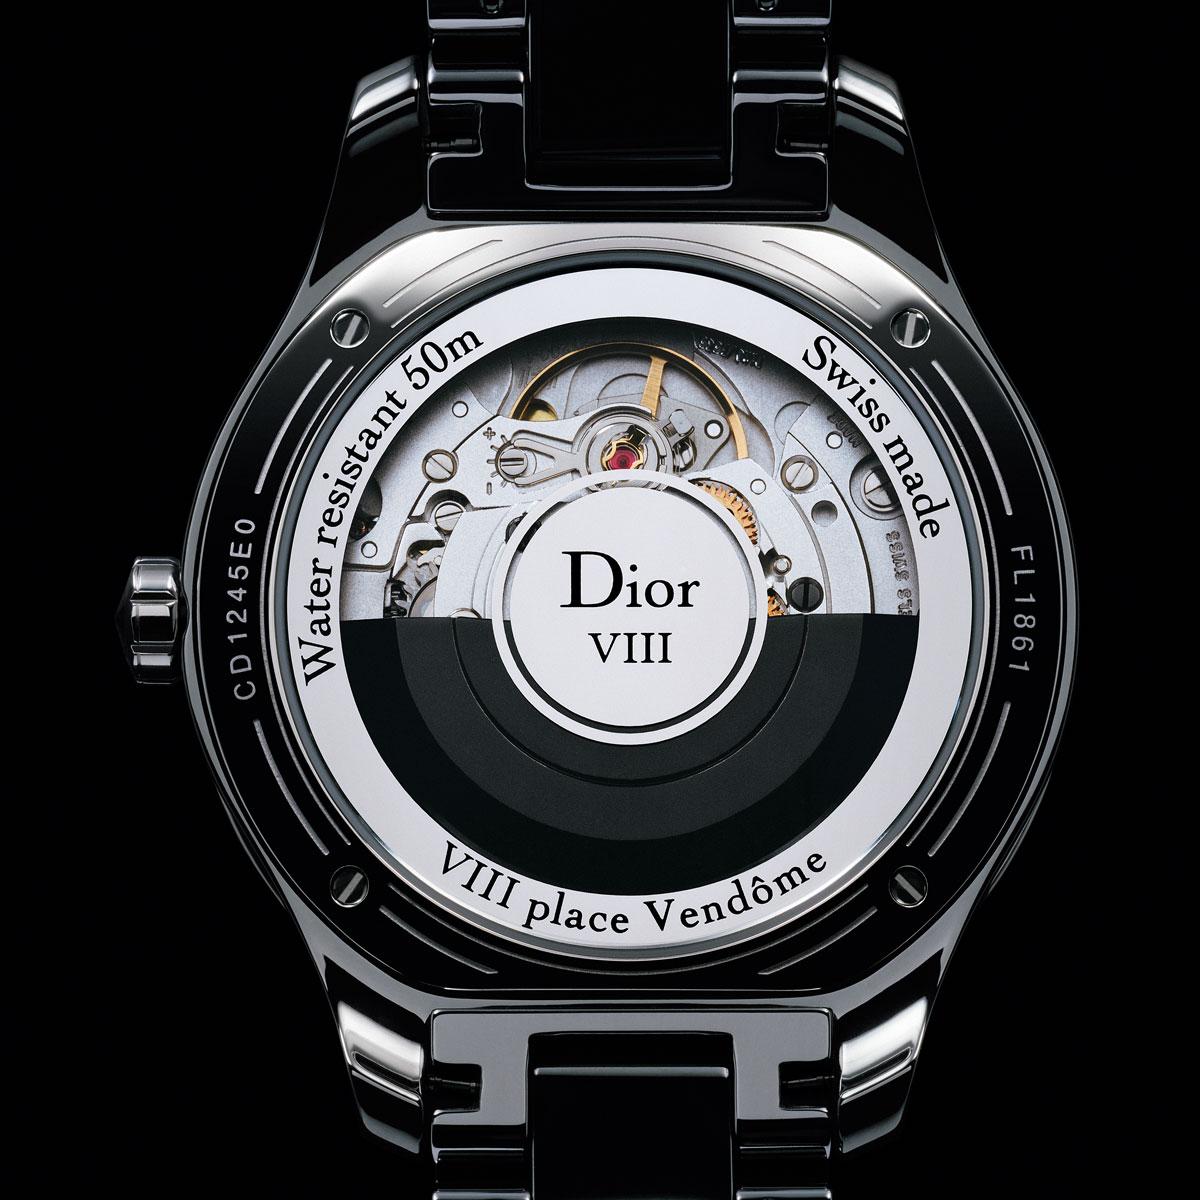 La Cote des Montres : Photo - Dior VIII